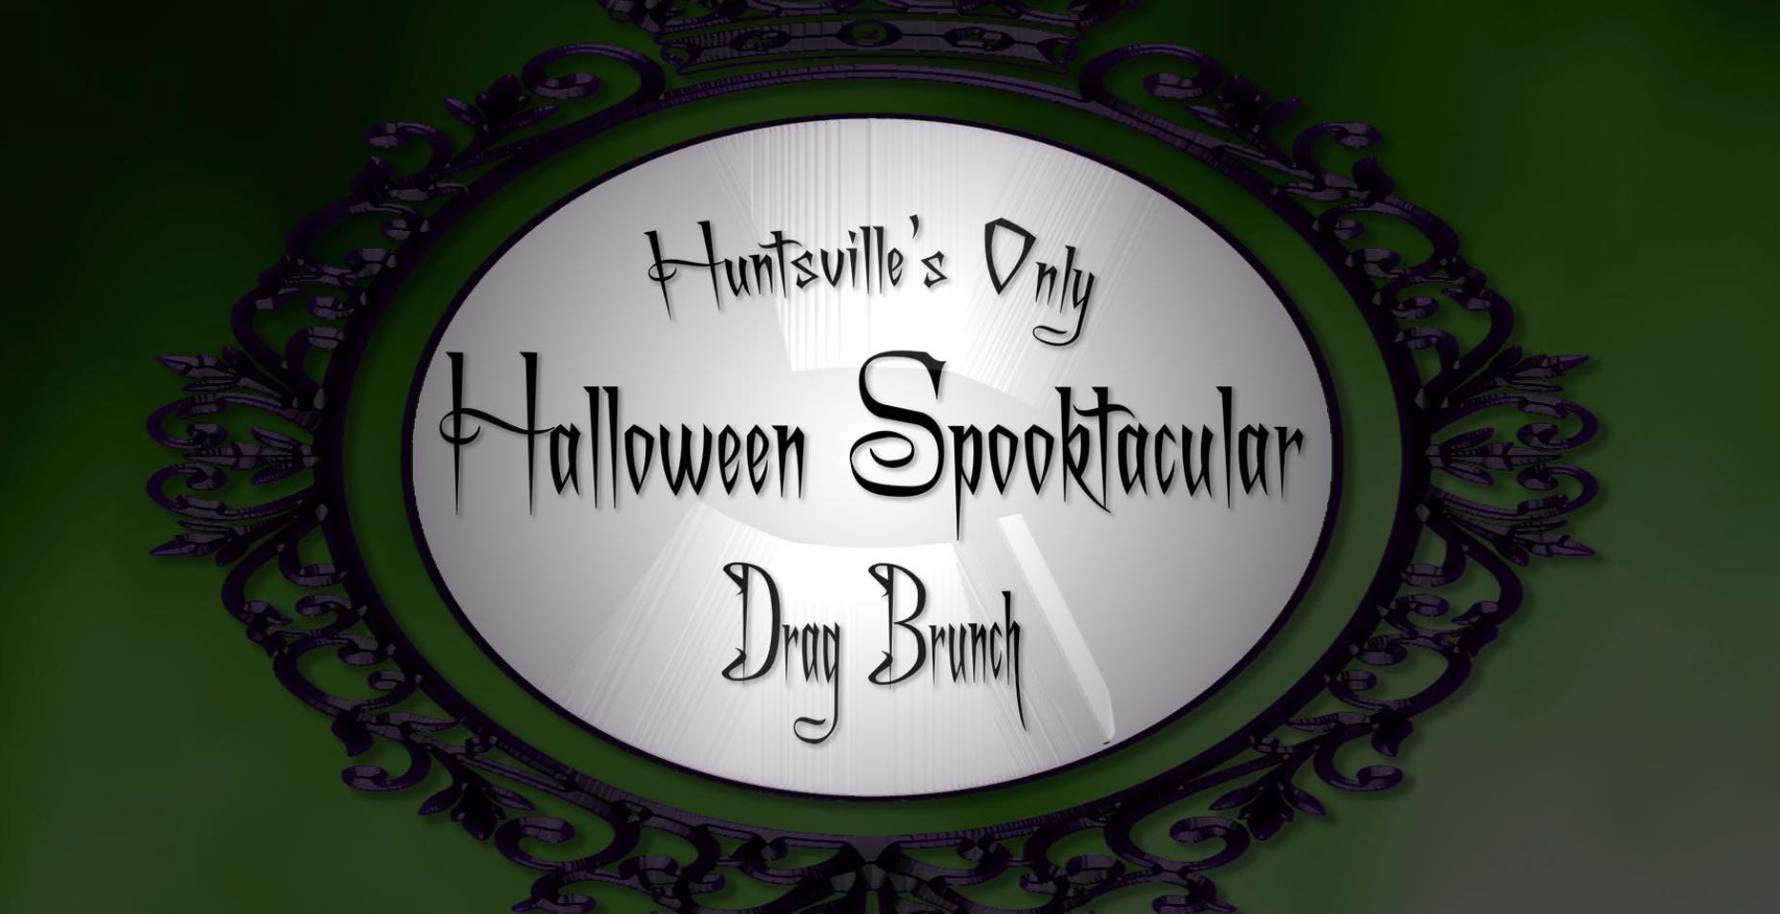 Halloween Spooktacular Drag Brunch